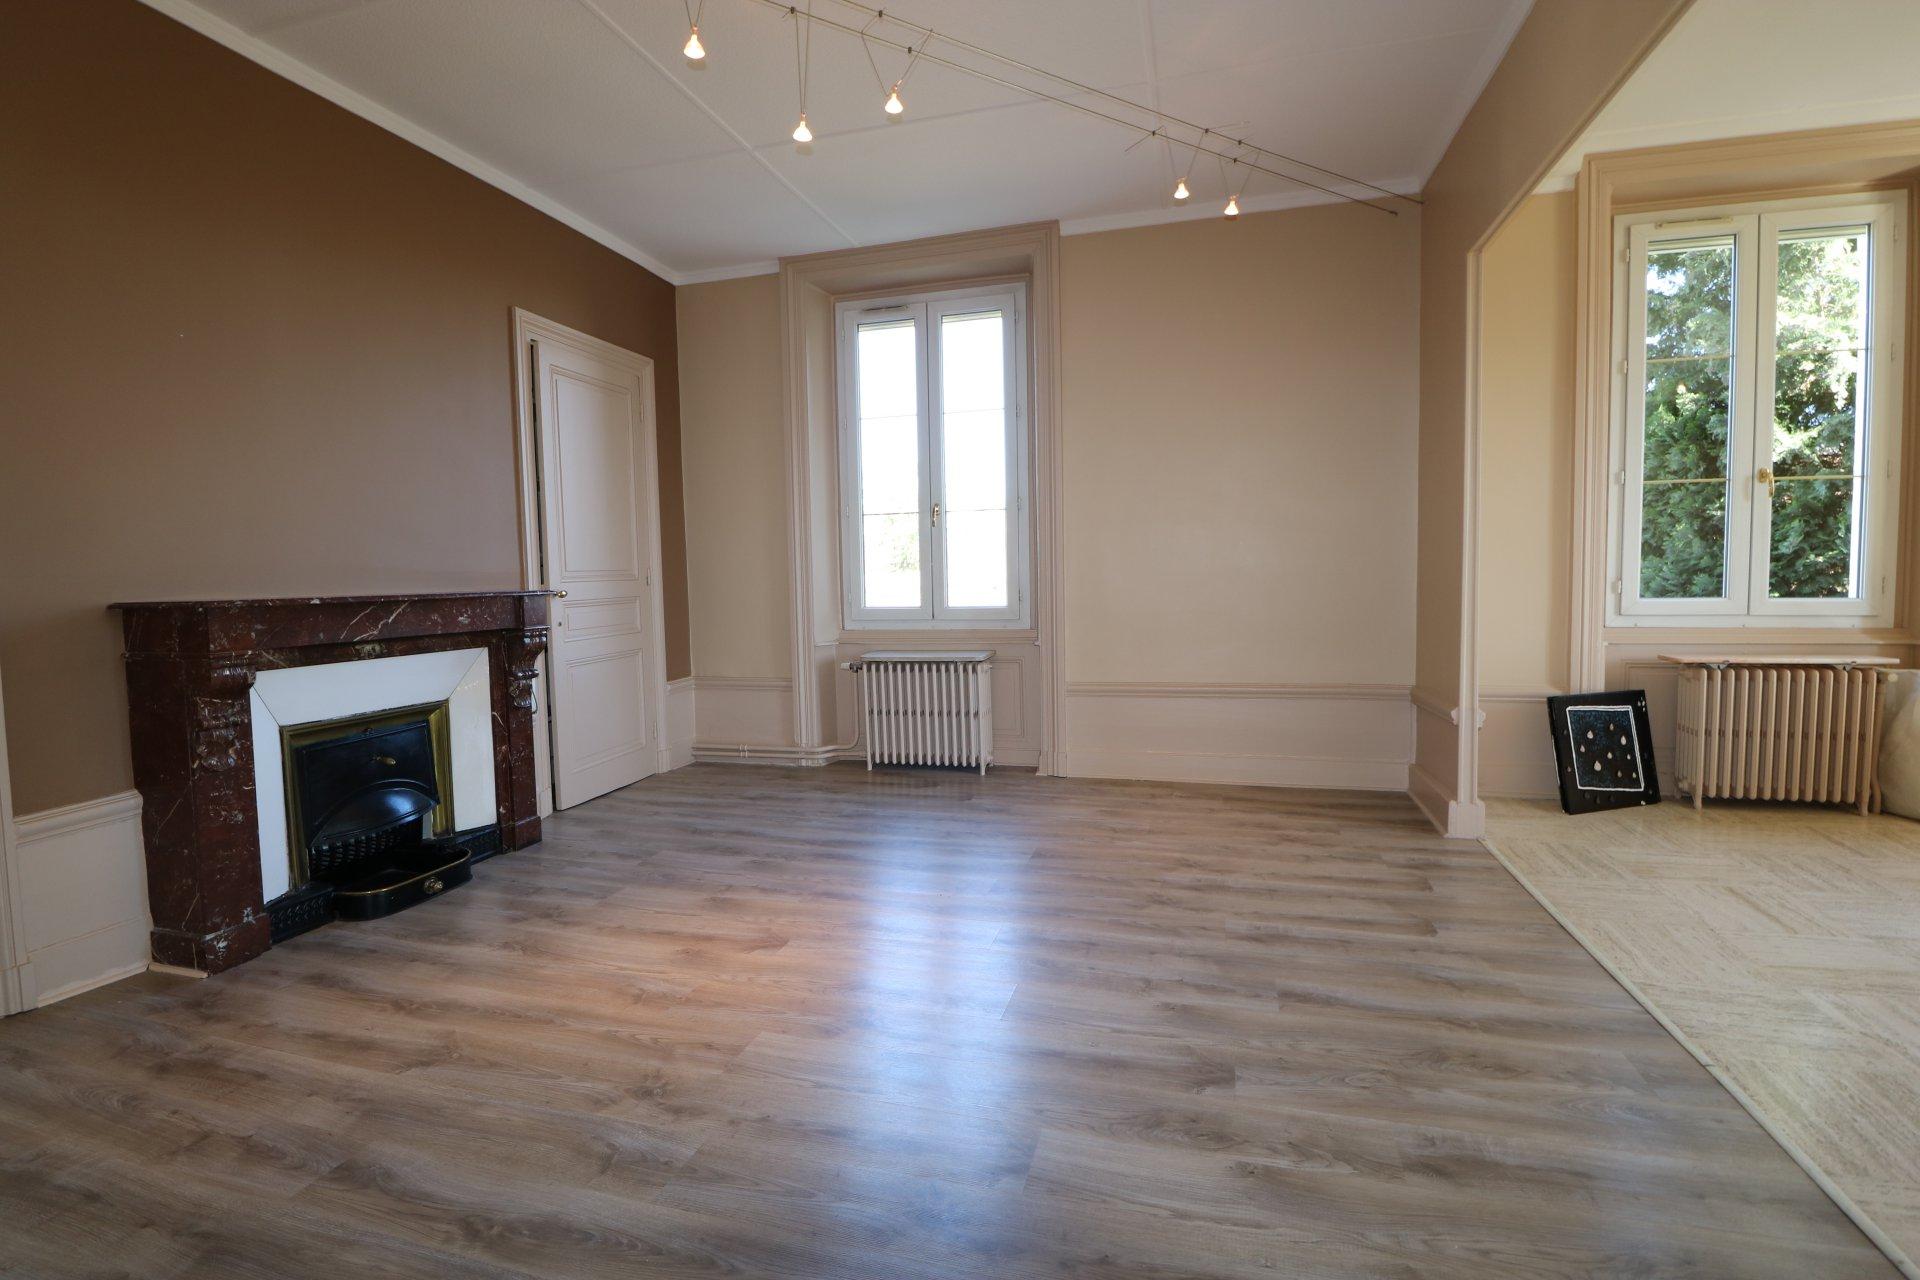 Maison bourgeoise 340 m2 habitables